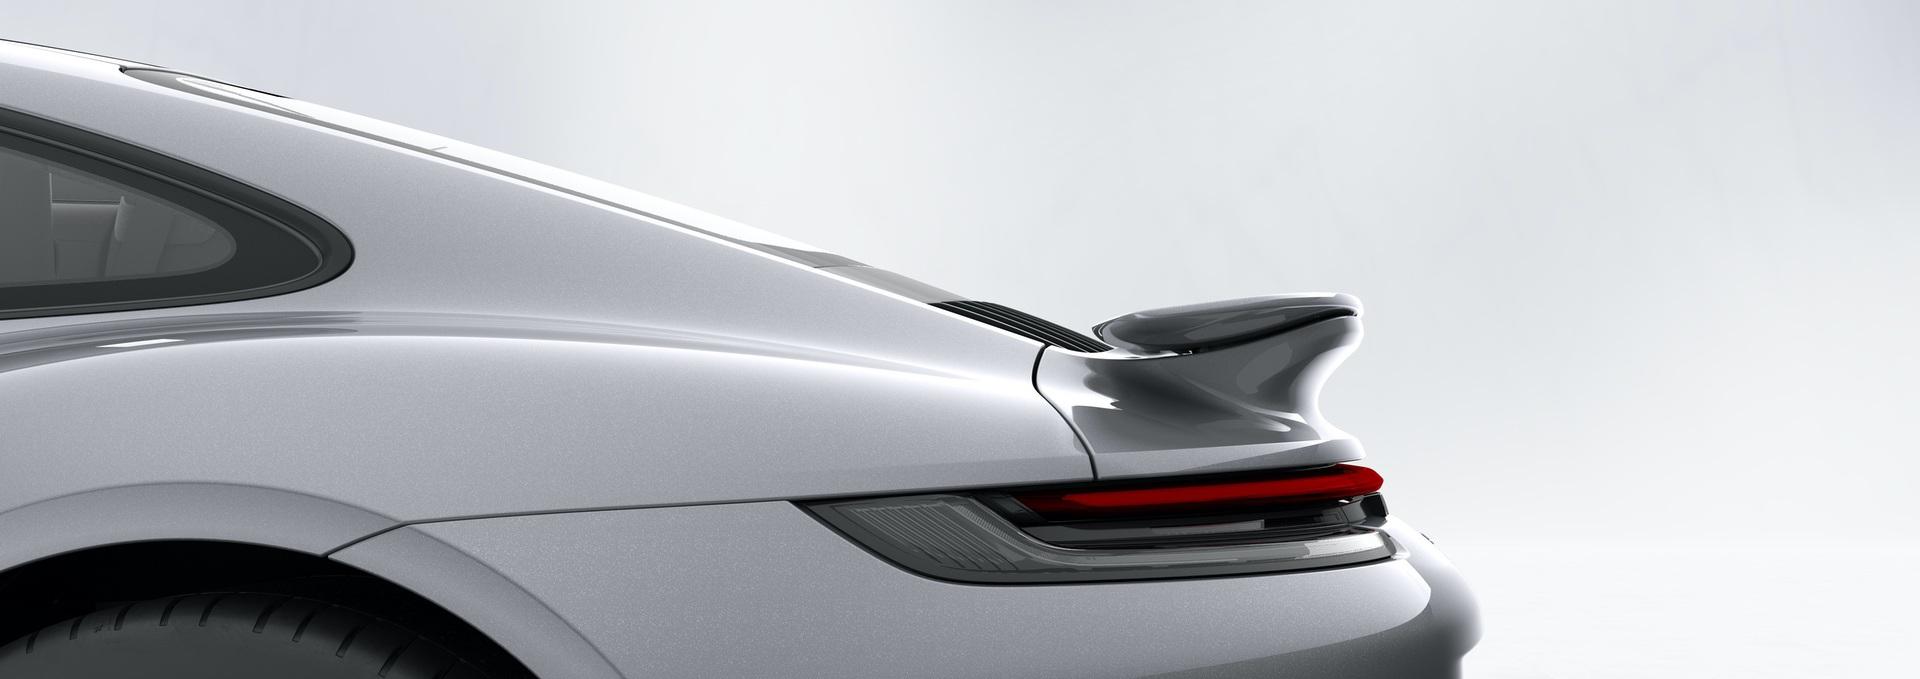 2020_Porsche_911-Turbo_S-aerodynamics_0006